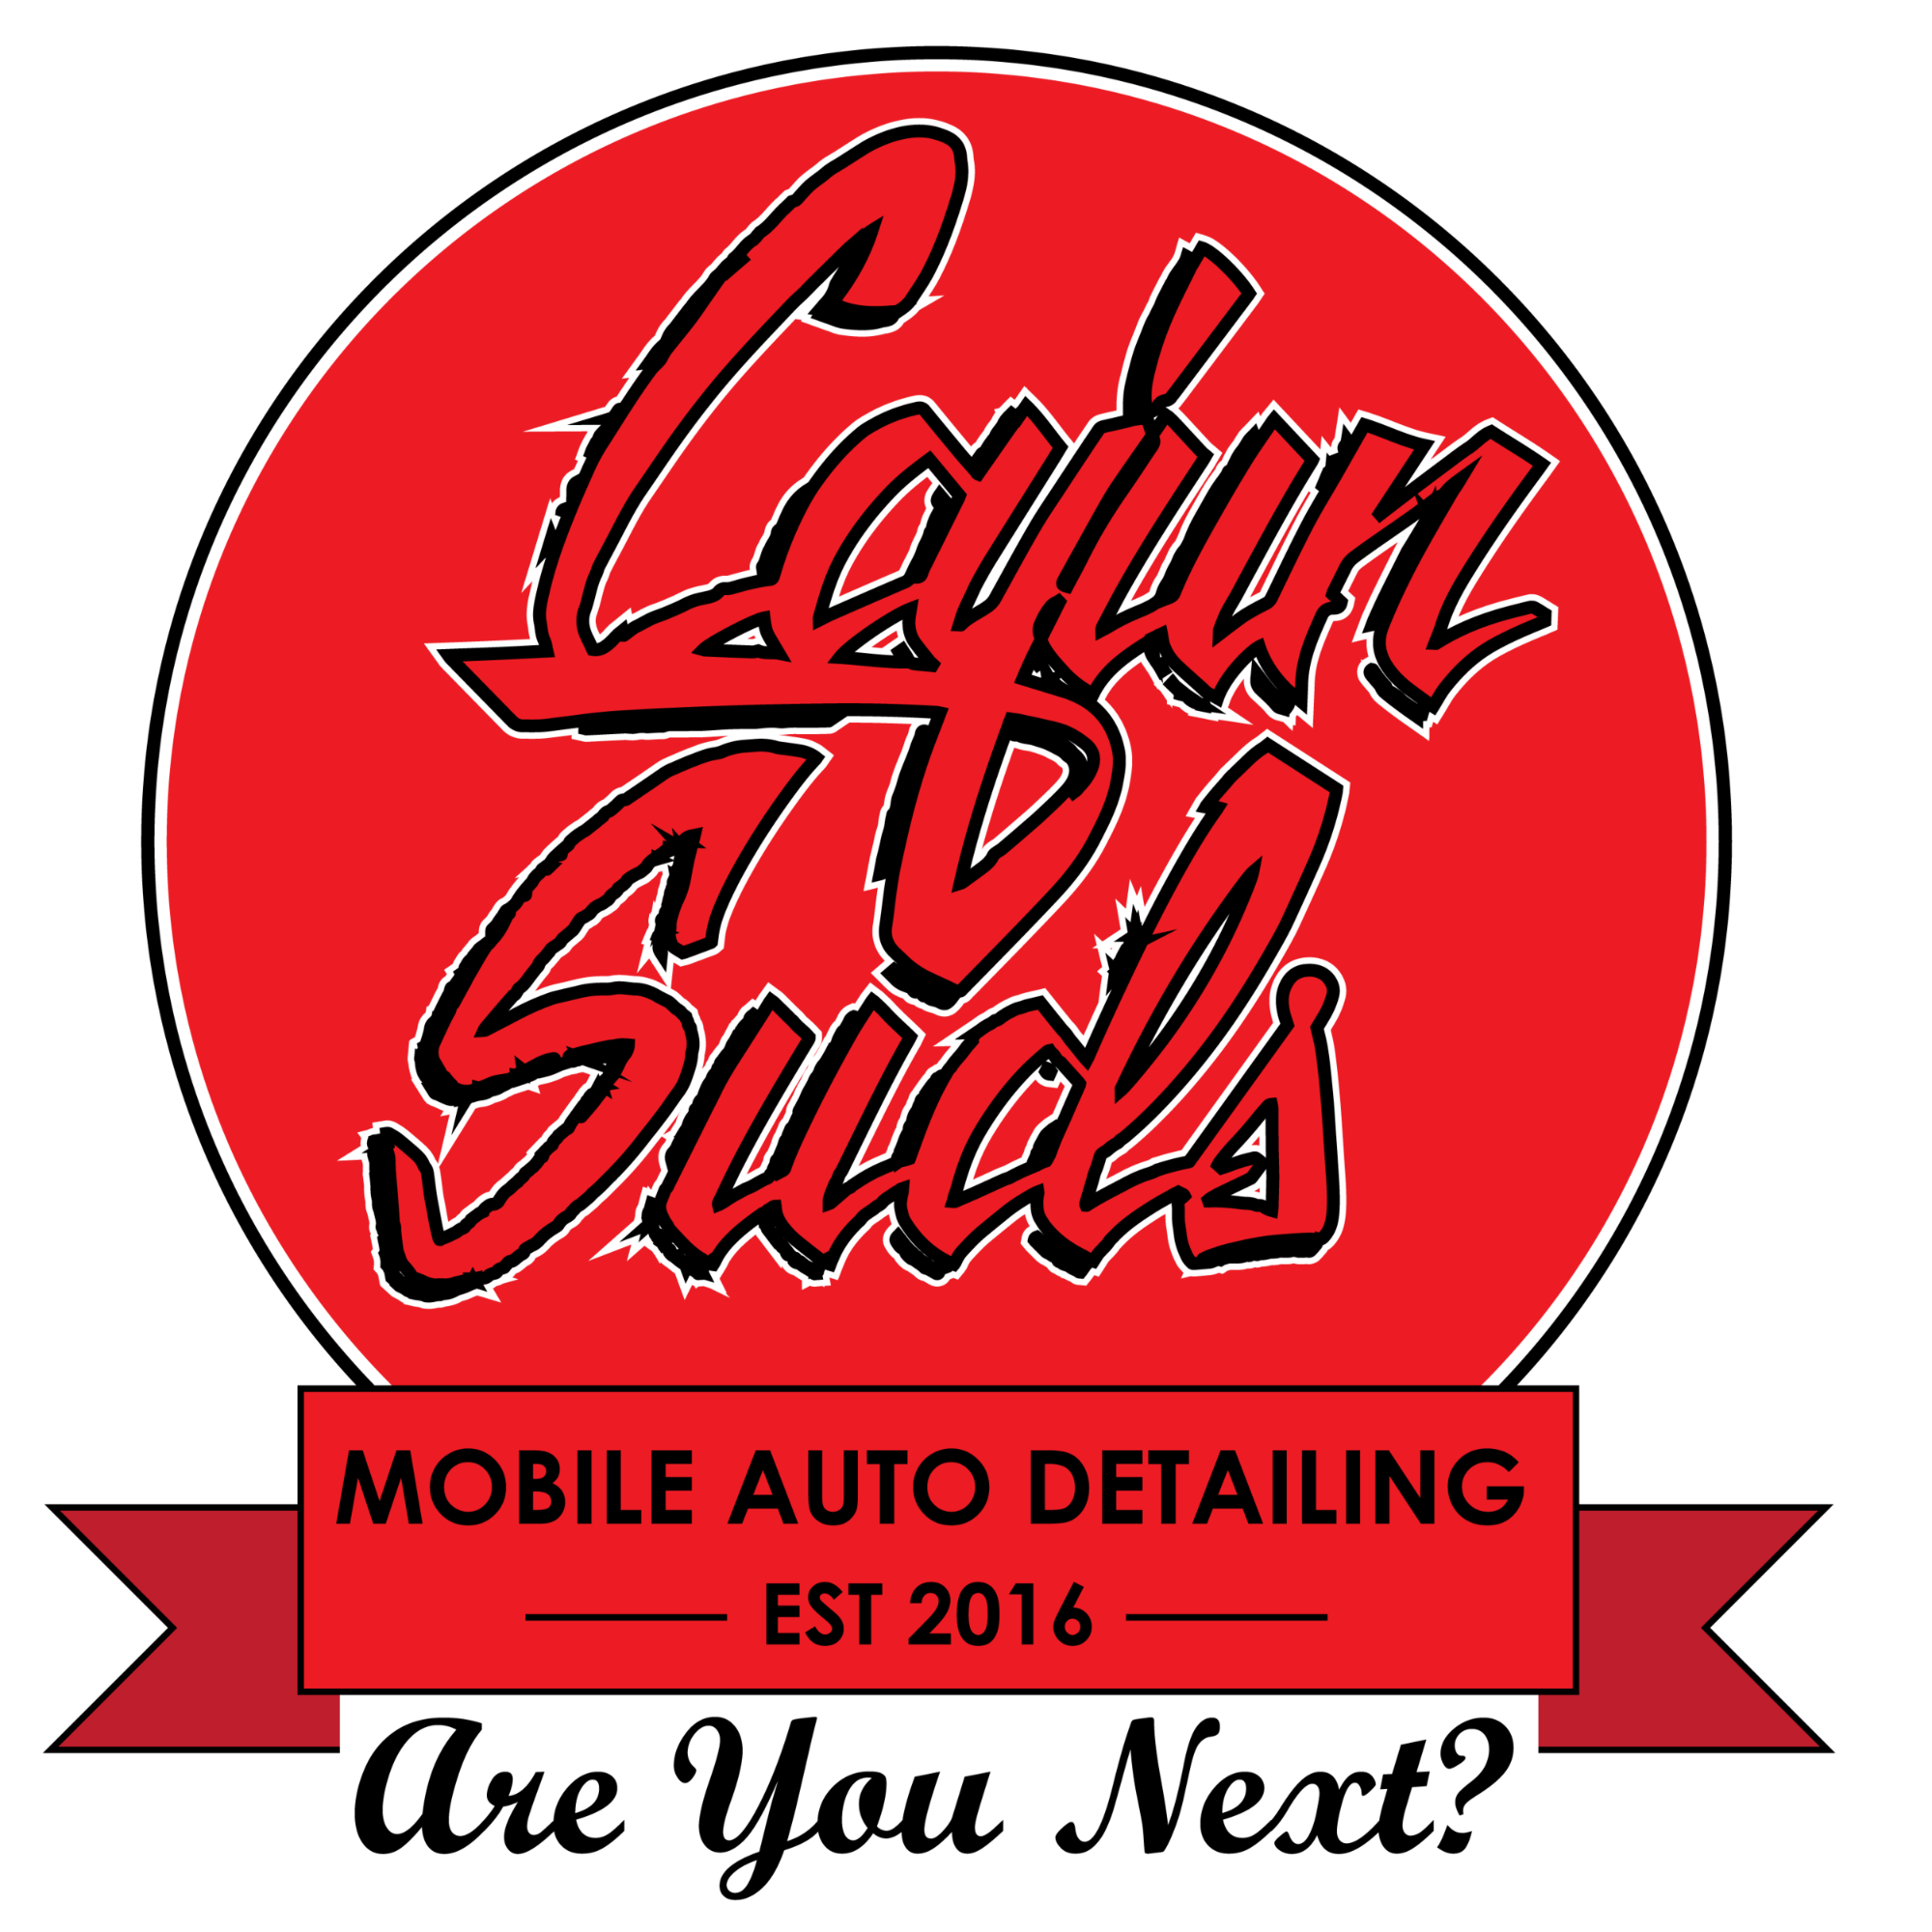 Cajun Suds mobile auto detailing. Auto detailing in lafayette la.